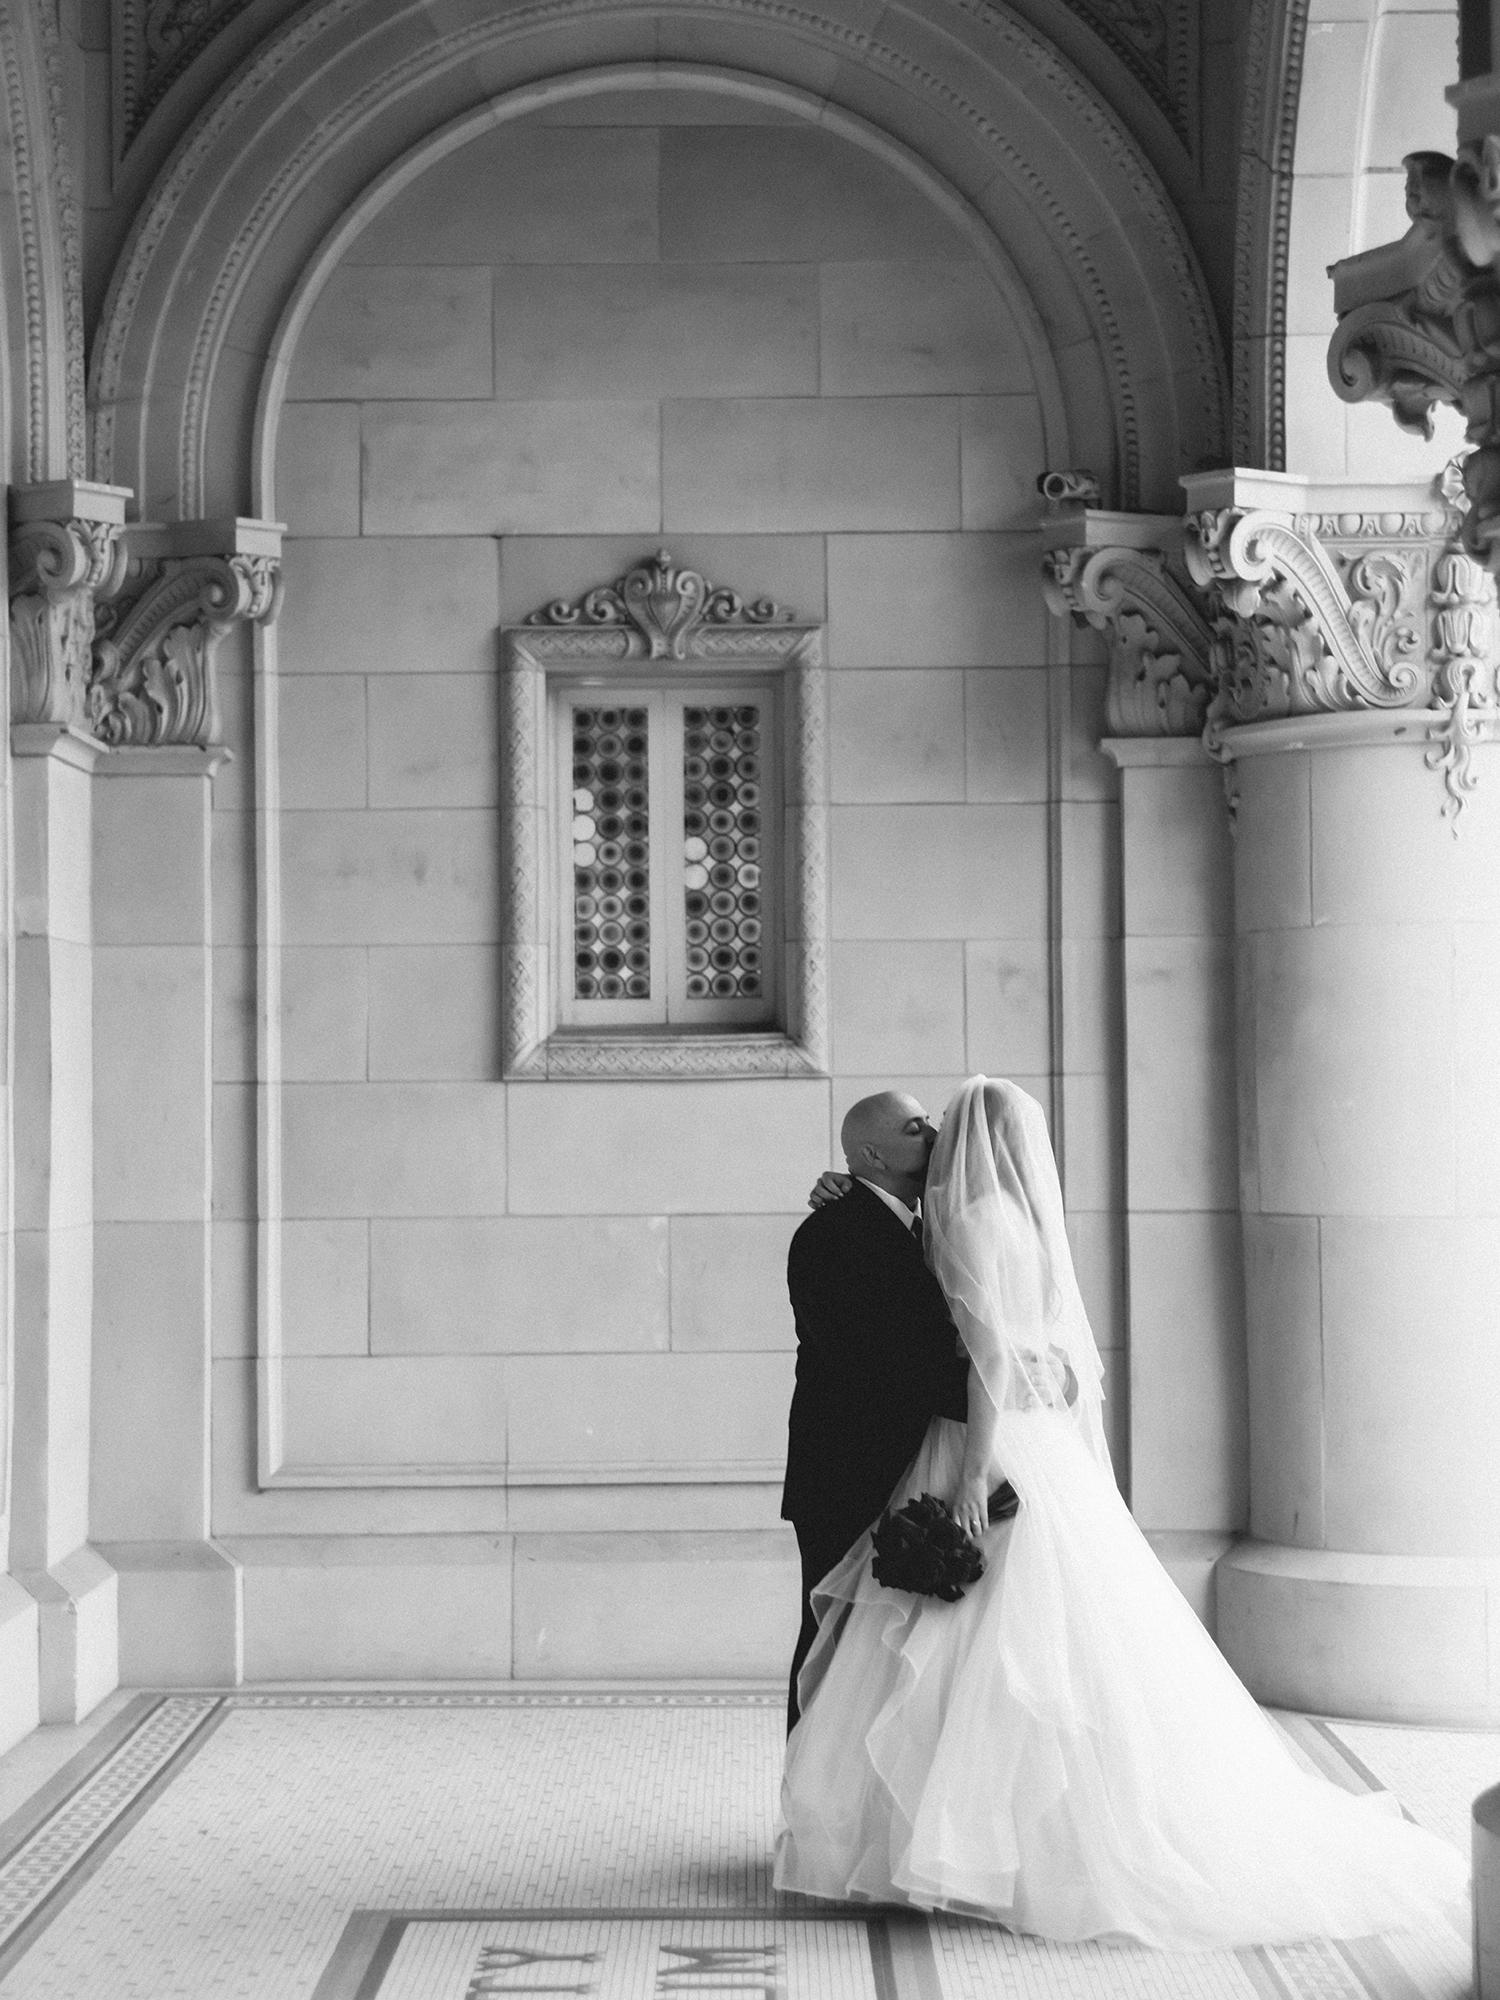 duff goldman johnna colbry married couple